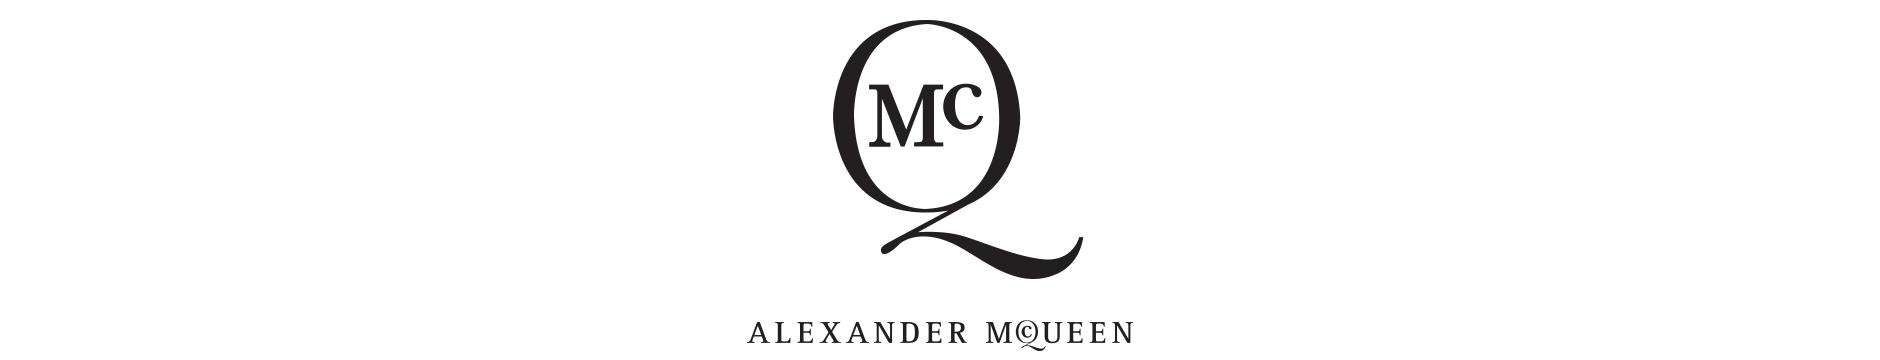 alexander mcqueen logo png wwwpixsharkcom images